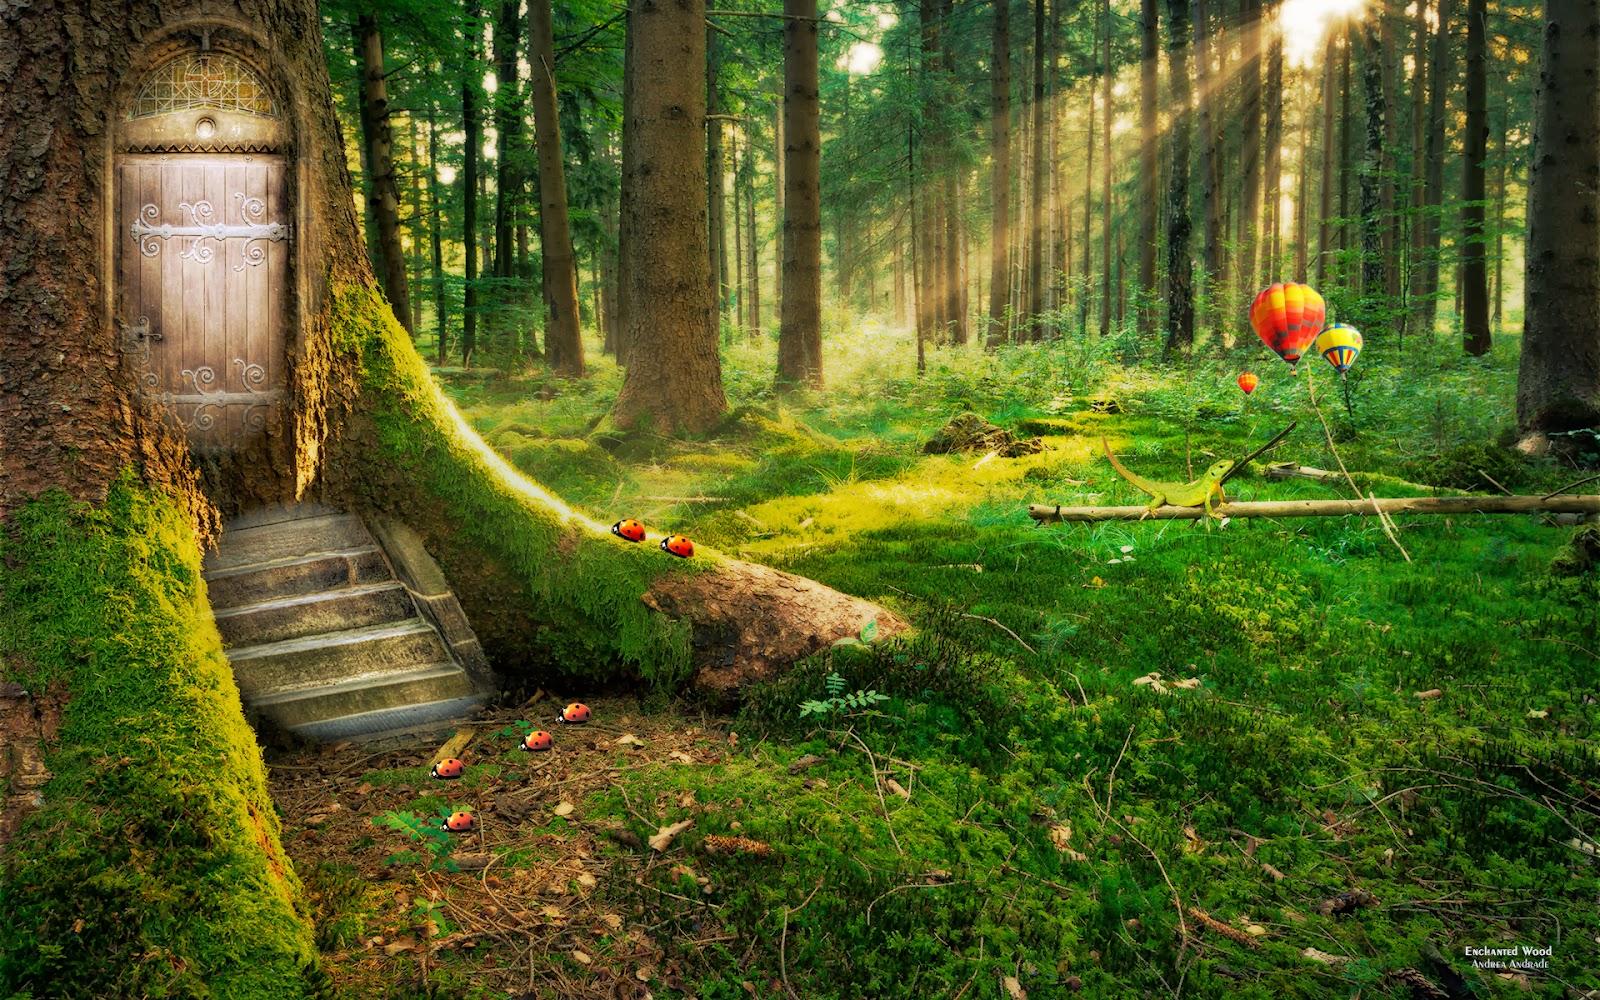 LEARNING GATEWAY: Descriptive Essay - An Enchanted Forest